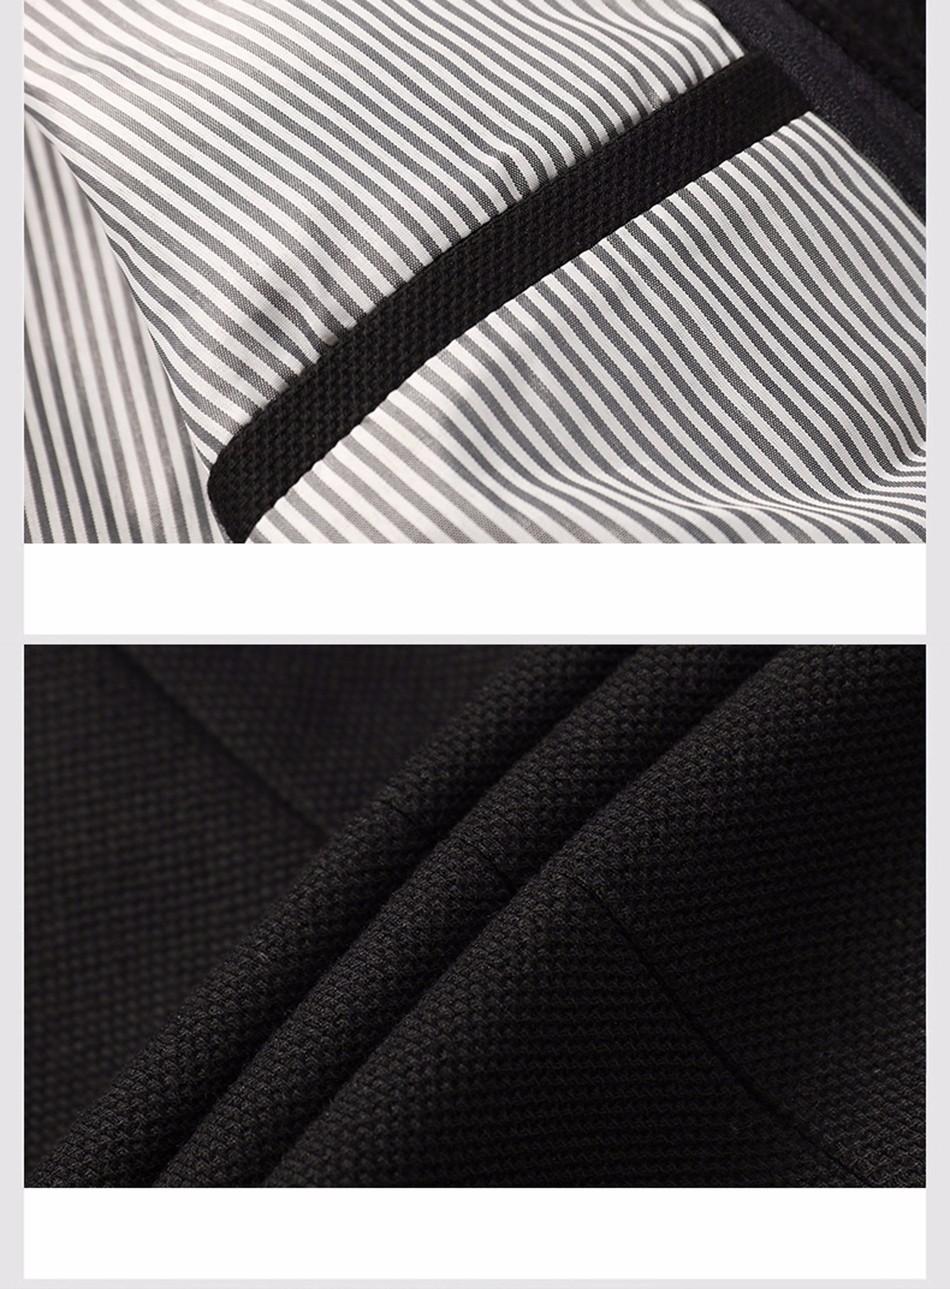 HTB1y x3OVXXXXa8aFXXq6xXFXXXH - Men Casual Warm Coats Size M-3XL Good Quality Single Breasted Design Thicken Men's Fashion Wool Clothings Lapel Design hsd-J316